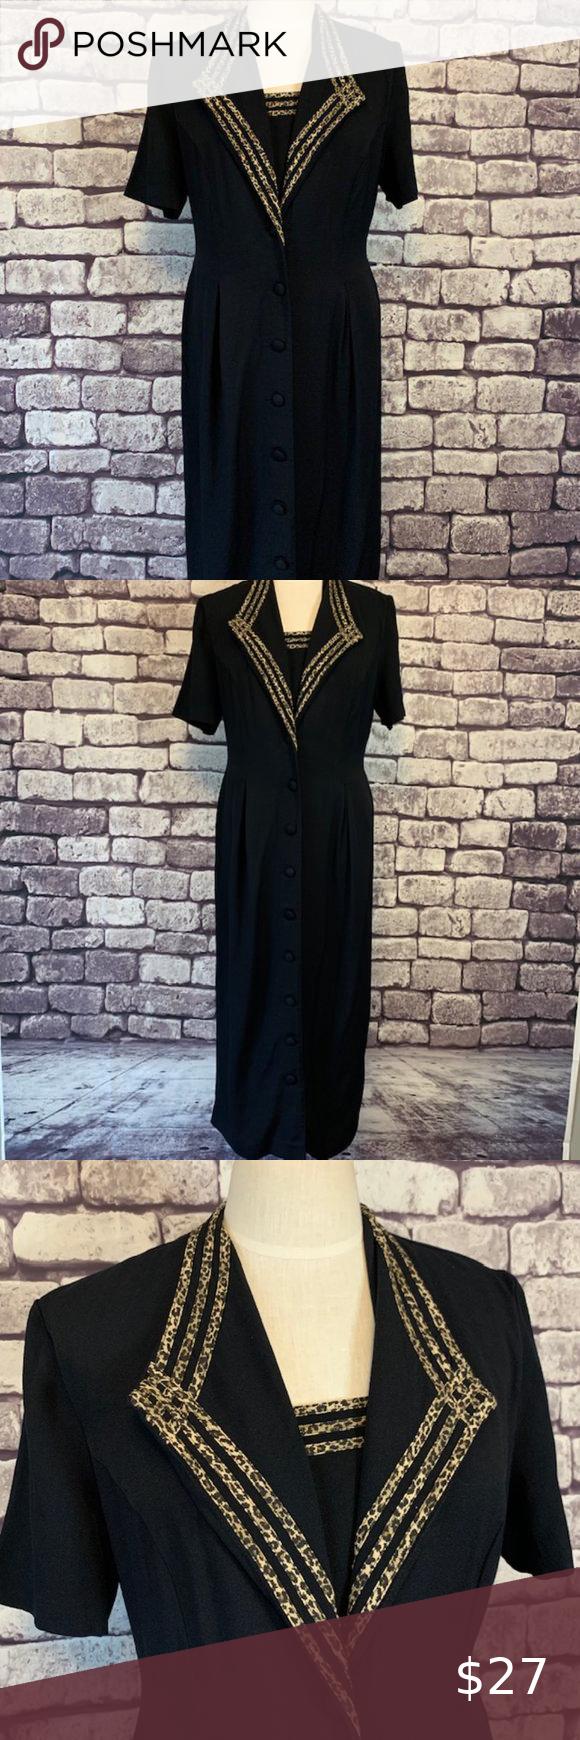 S L Fashion Vintage Black Dress Size 12 Vintage Black Dress Sl Fashions Dress Fashion [ 1740 x 580 Pixel ]